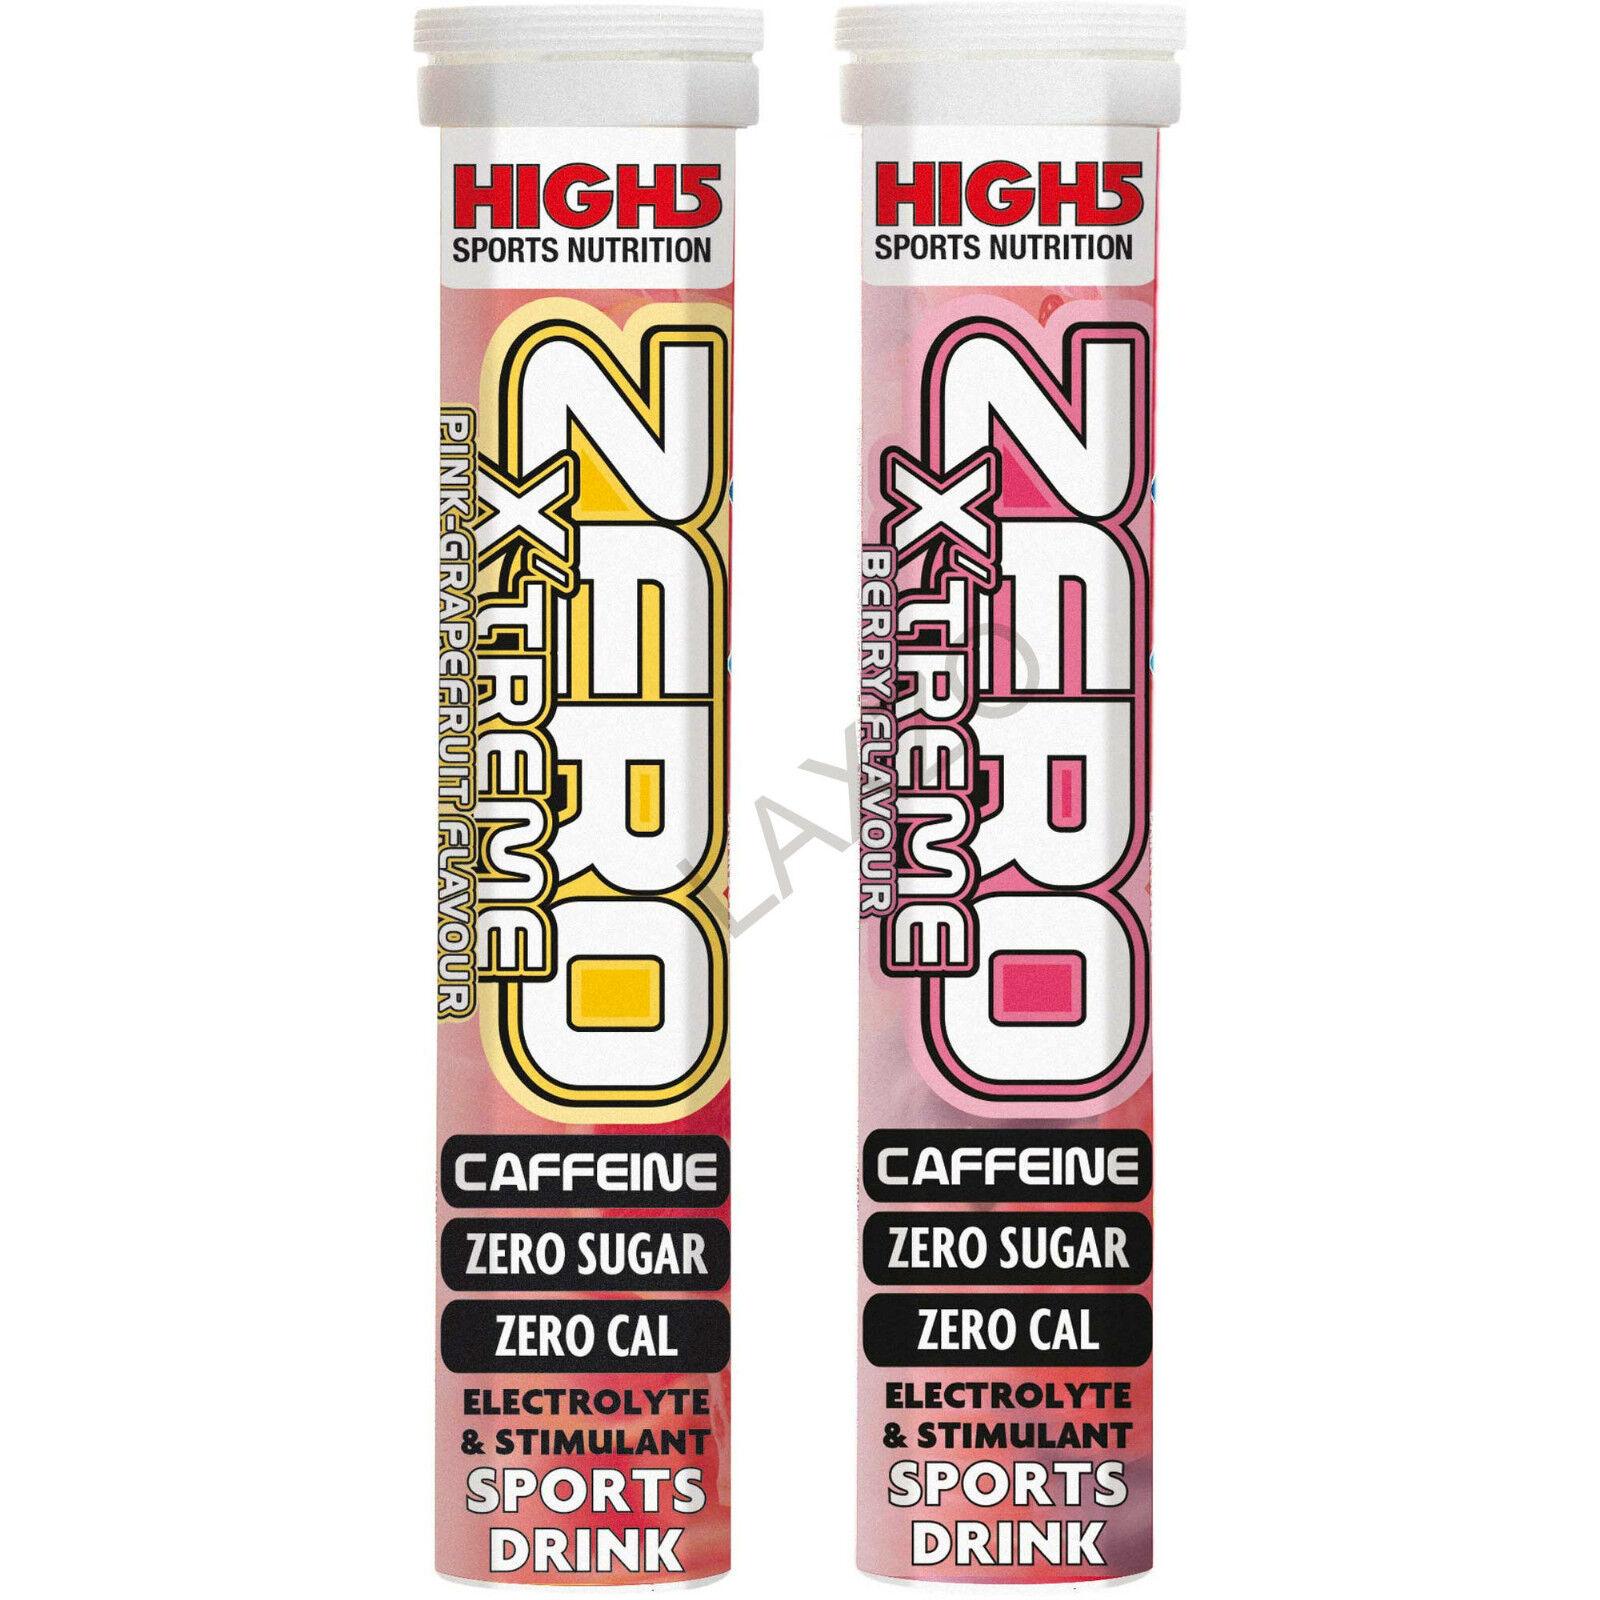 High5 Zero Xtreme Hydration Elektrolyt Getränk Tabletten Sport Getränk Radsport